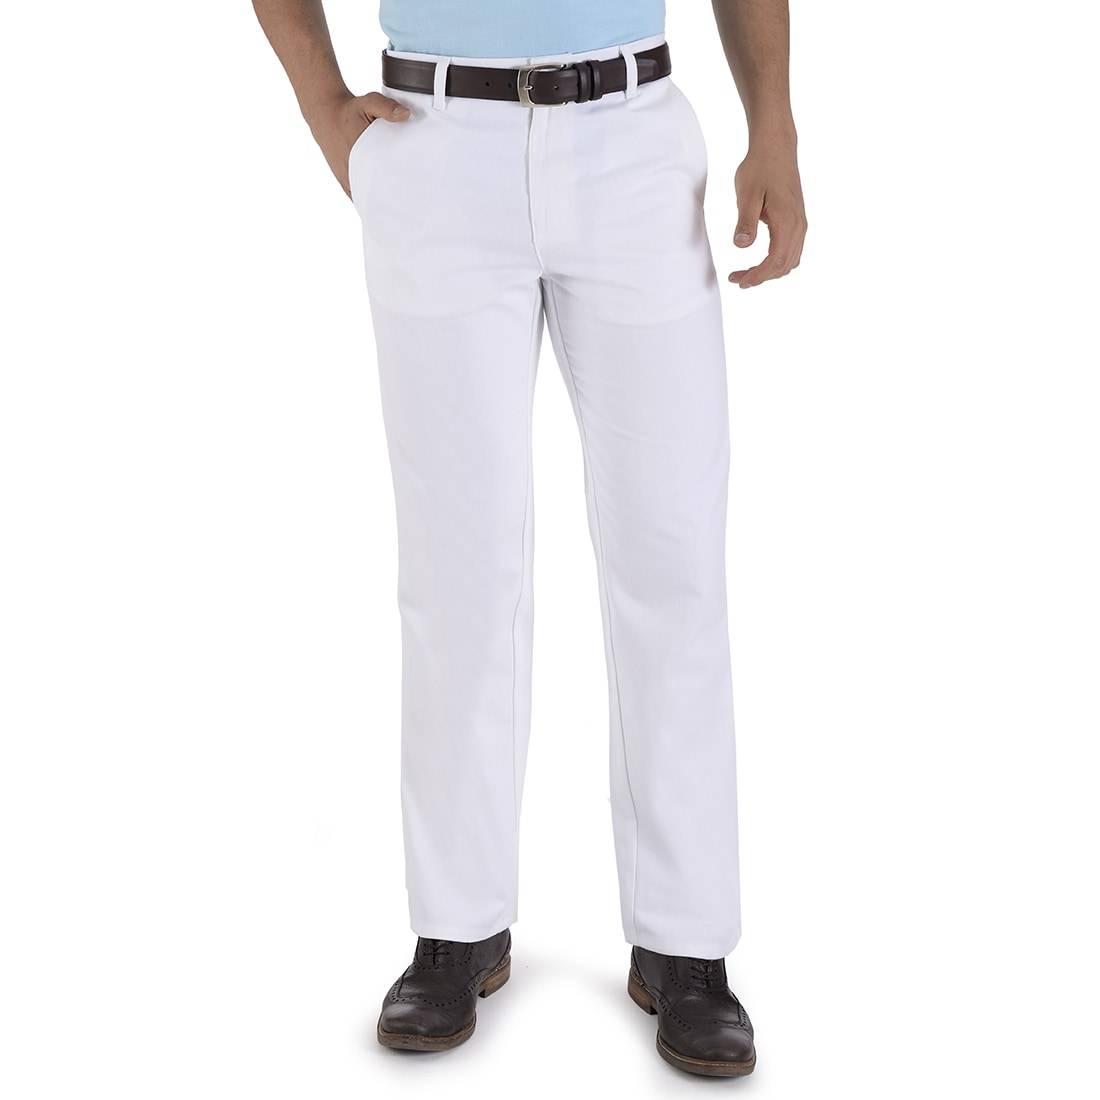 010789055202-01-Pantalon-Casual-Classic-Fit-Blanco-yale